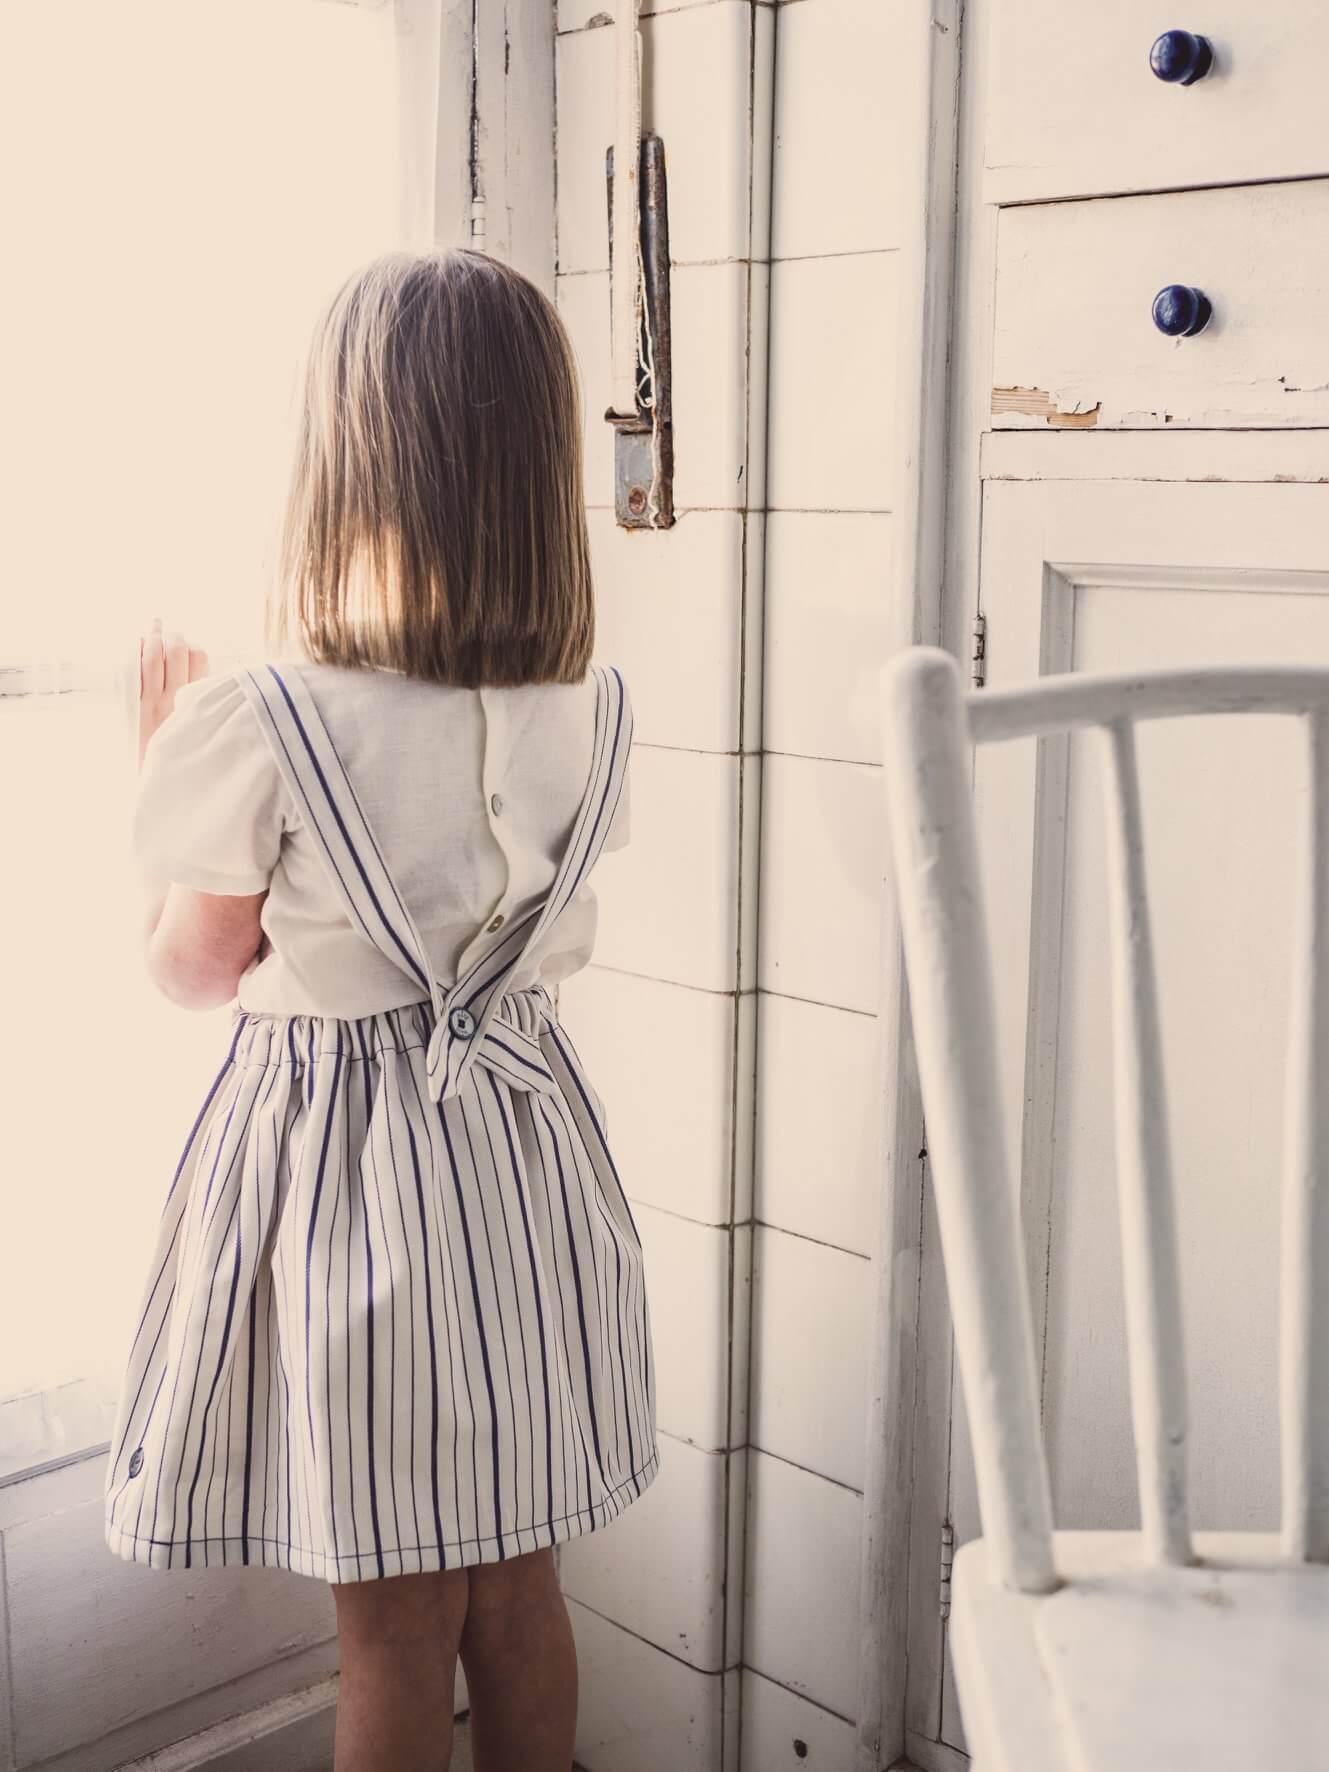 MÅNE children's clothes